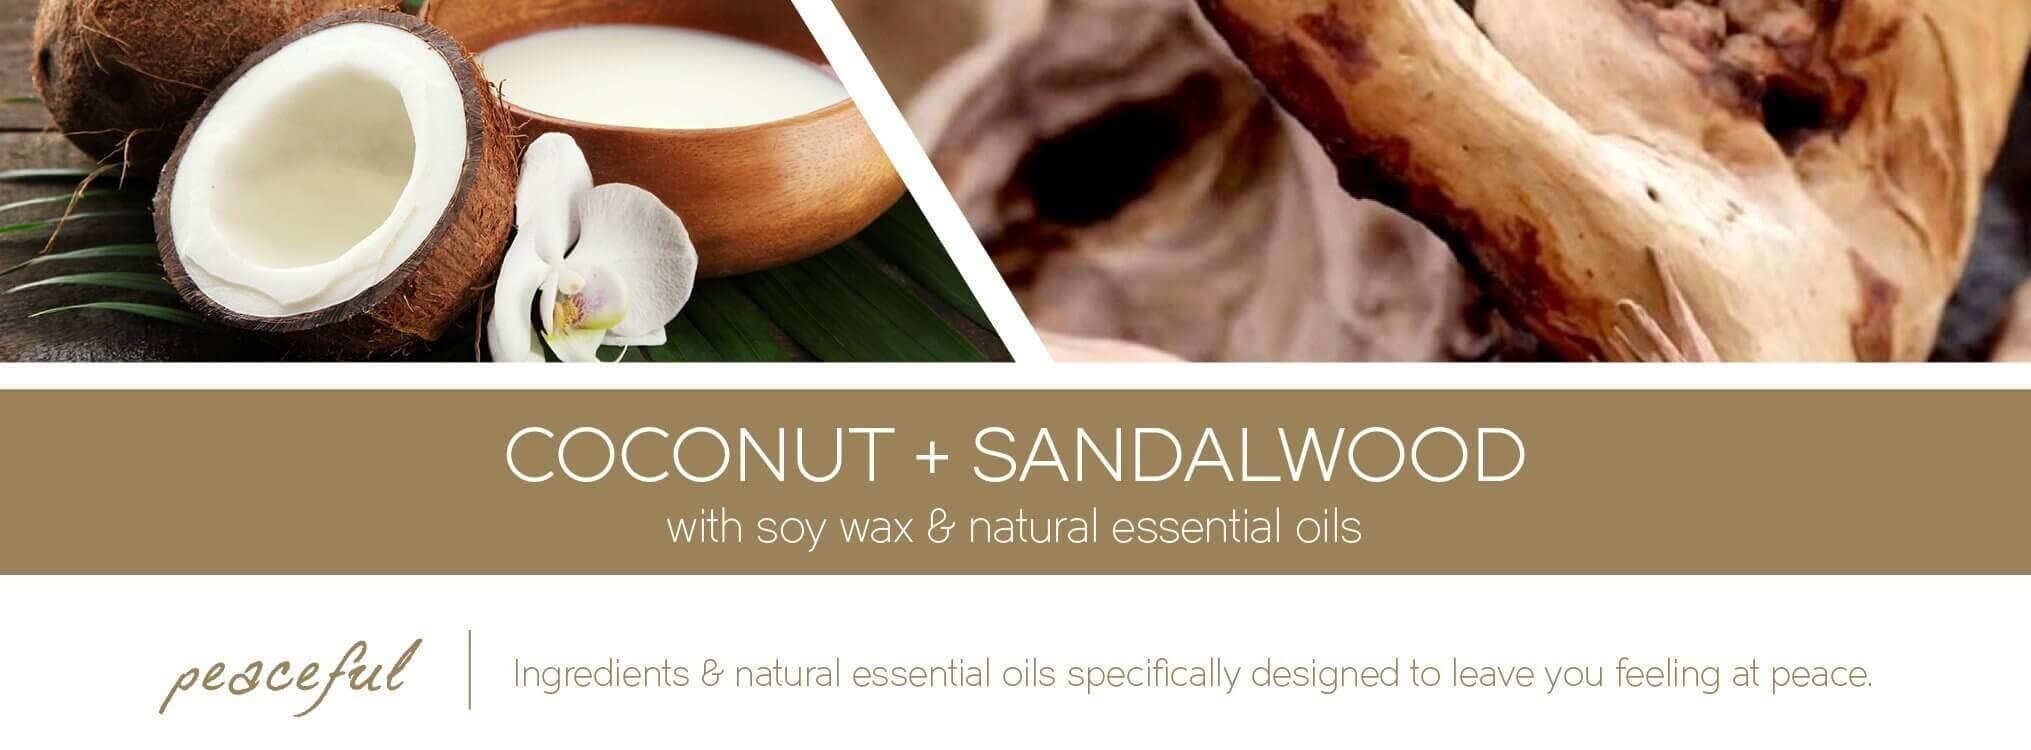 coconut-sandalwood-aromatherapy-candle-fragranceBMPTUDv1ZSZd8